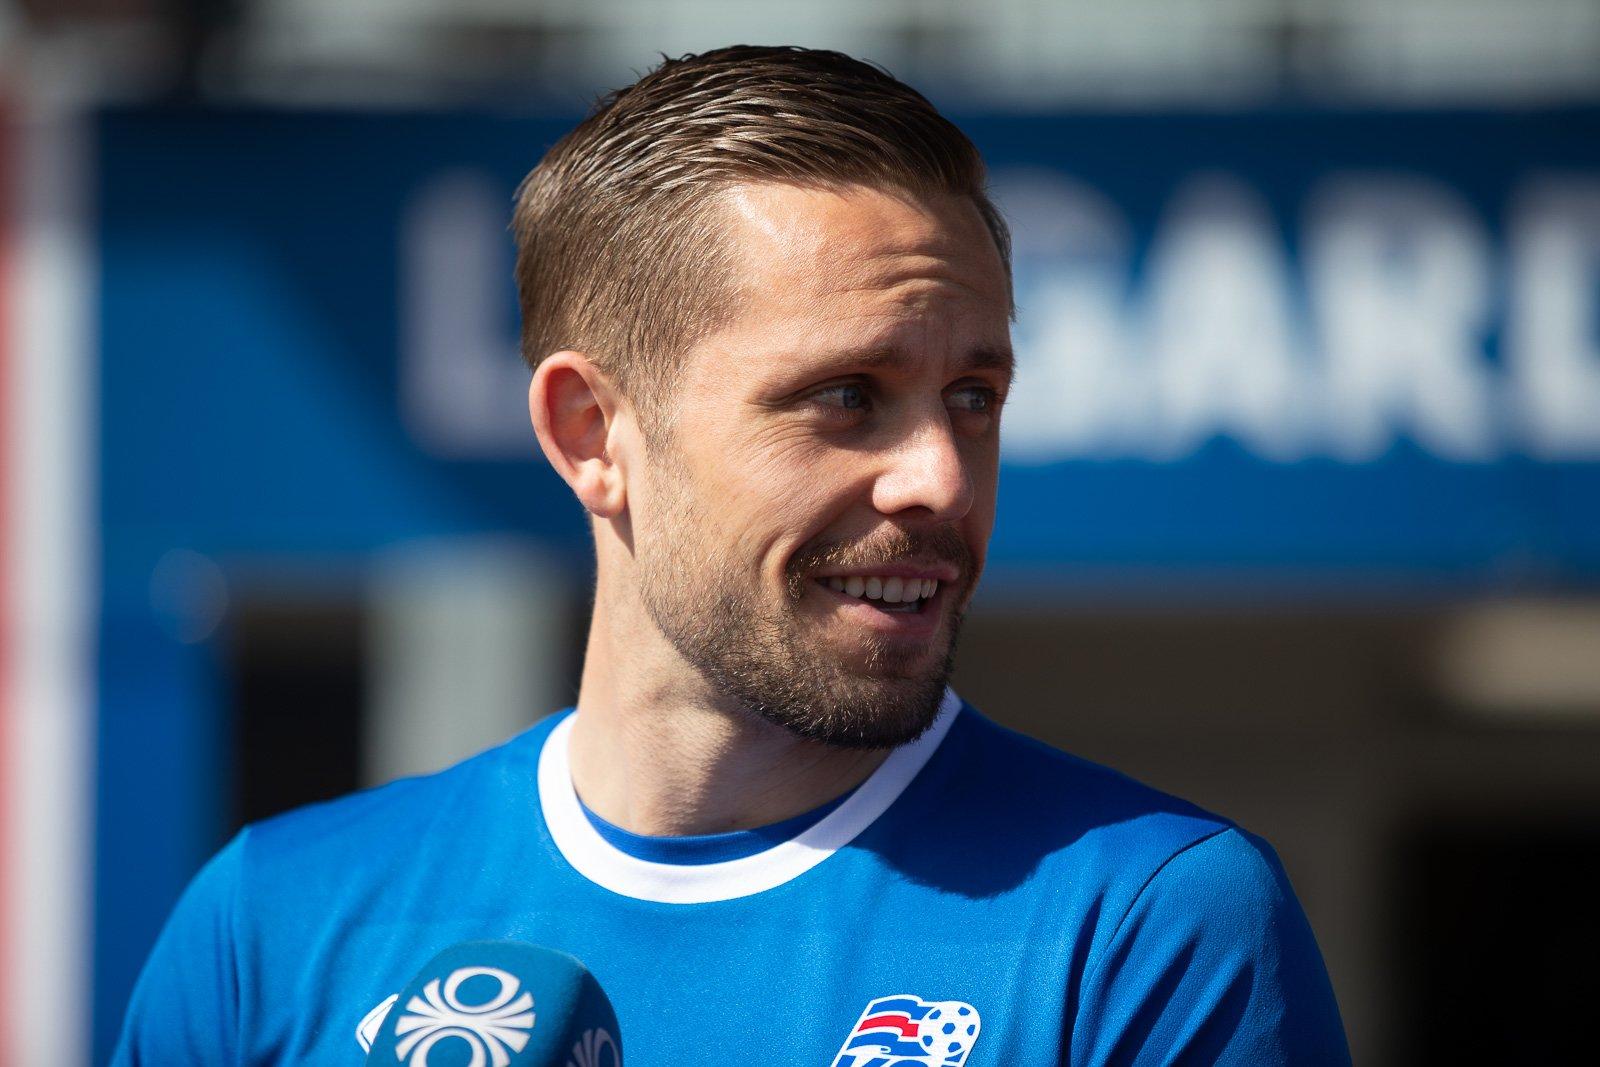 Interview: Gylfi Sigurðsson On Teamwork, Viking Spirit, And Iceland's First World Cup